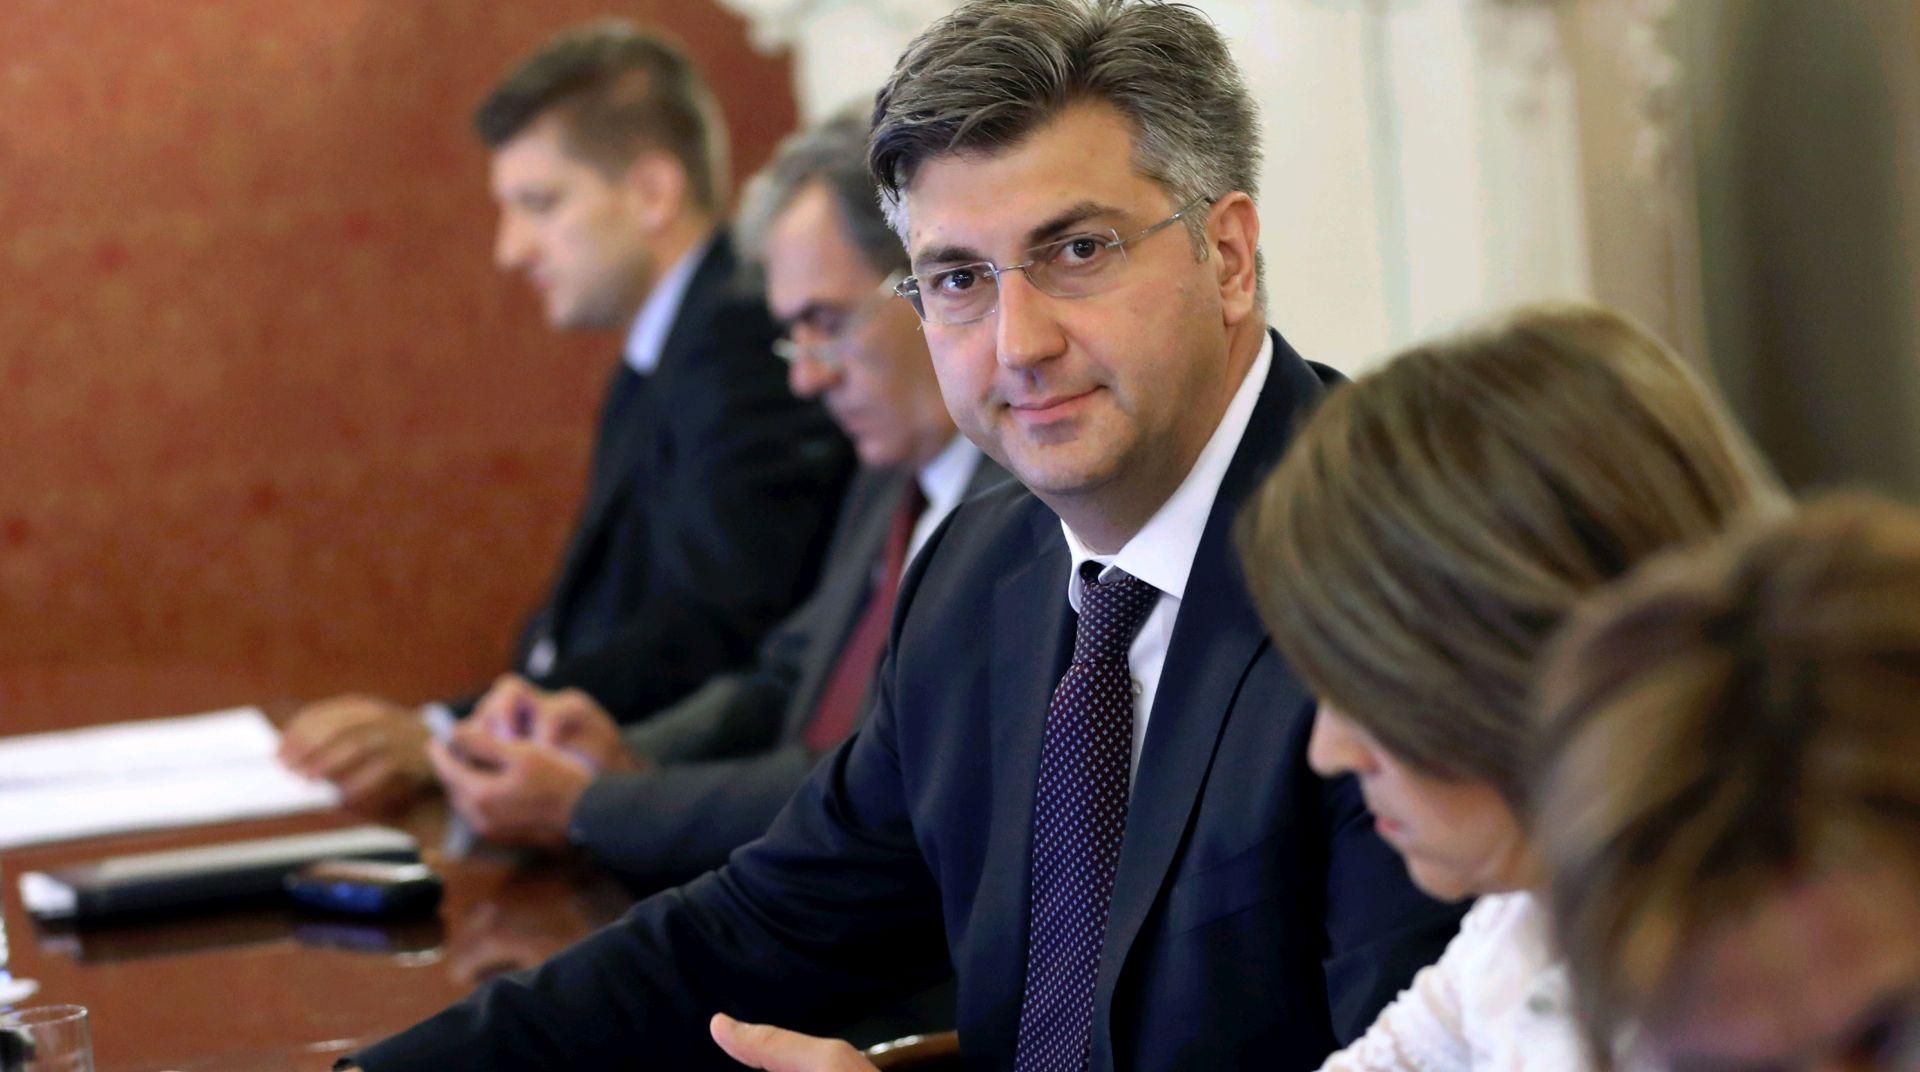 PAD HRVATSKE NA LISTI DOING BUSINESS Pretekle nas Srbija, Bugarska i Kosovo